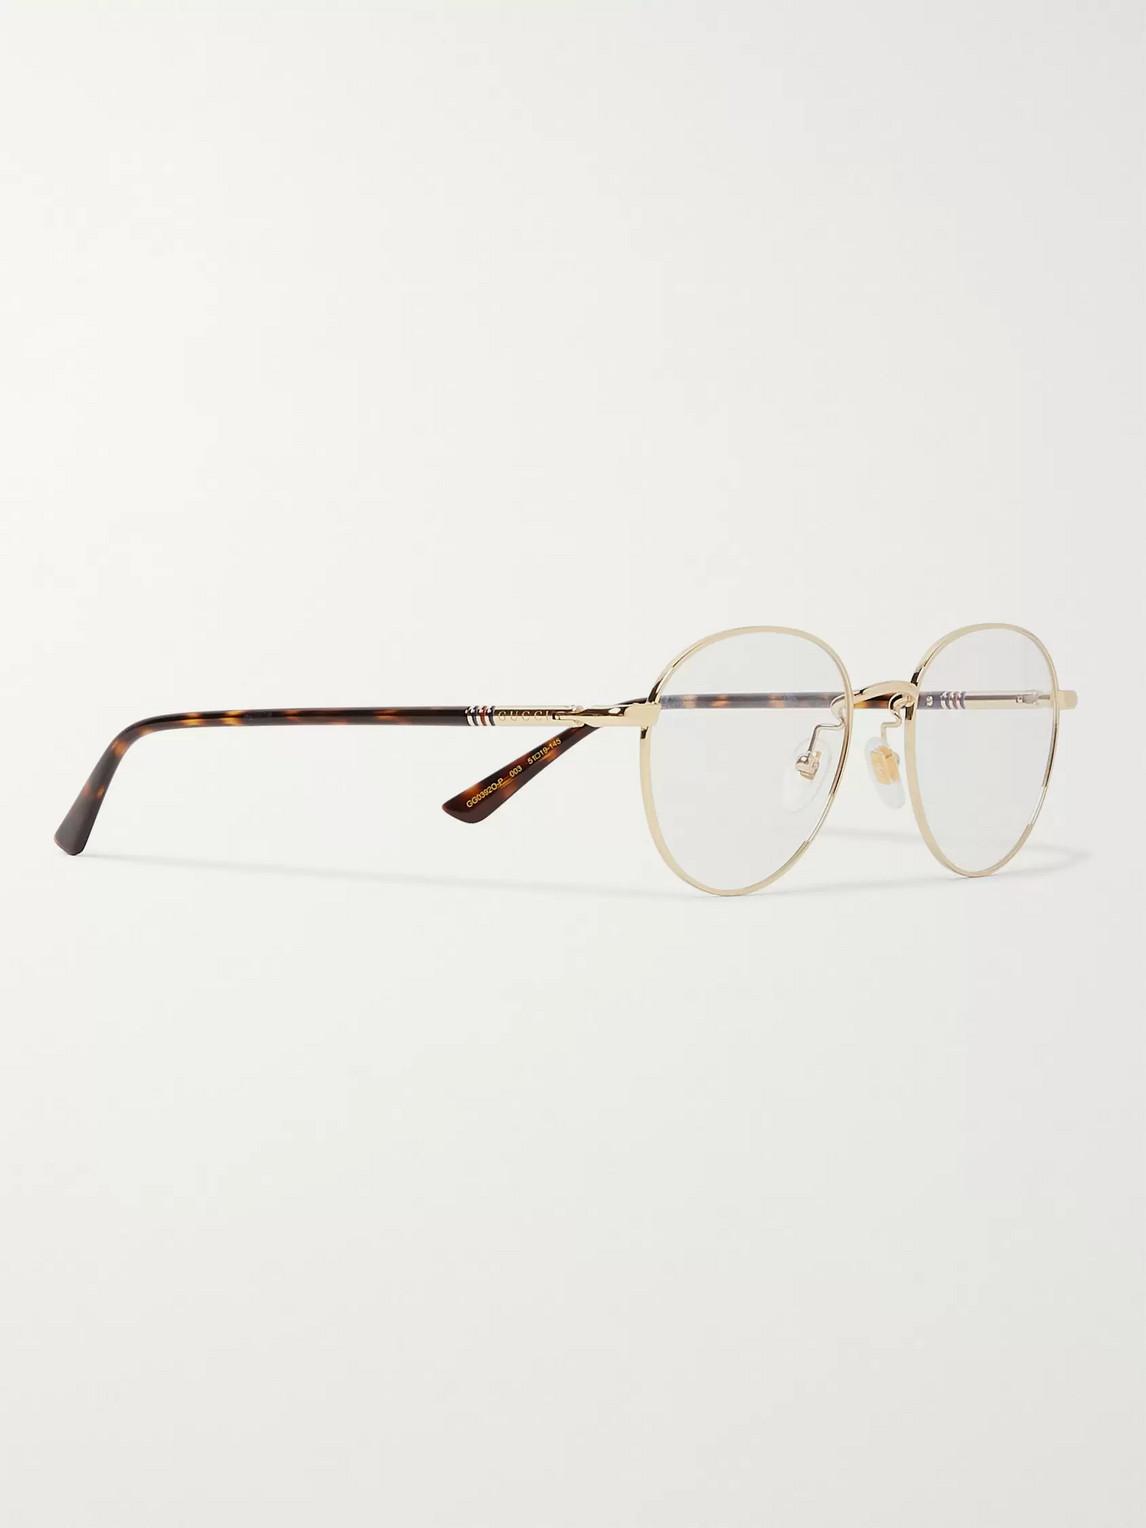 Gucci Opticals ROUND-FRAME GOLD-TONE AND TORTOISESHELL ACETATE OPTICAL GLASSES